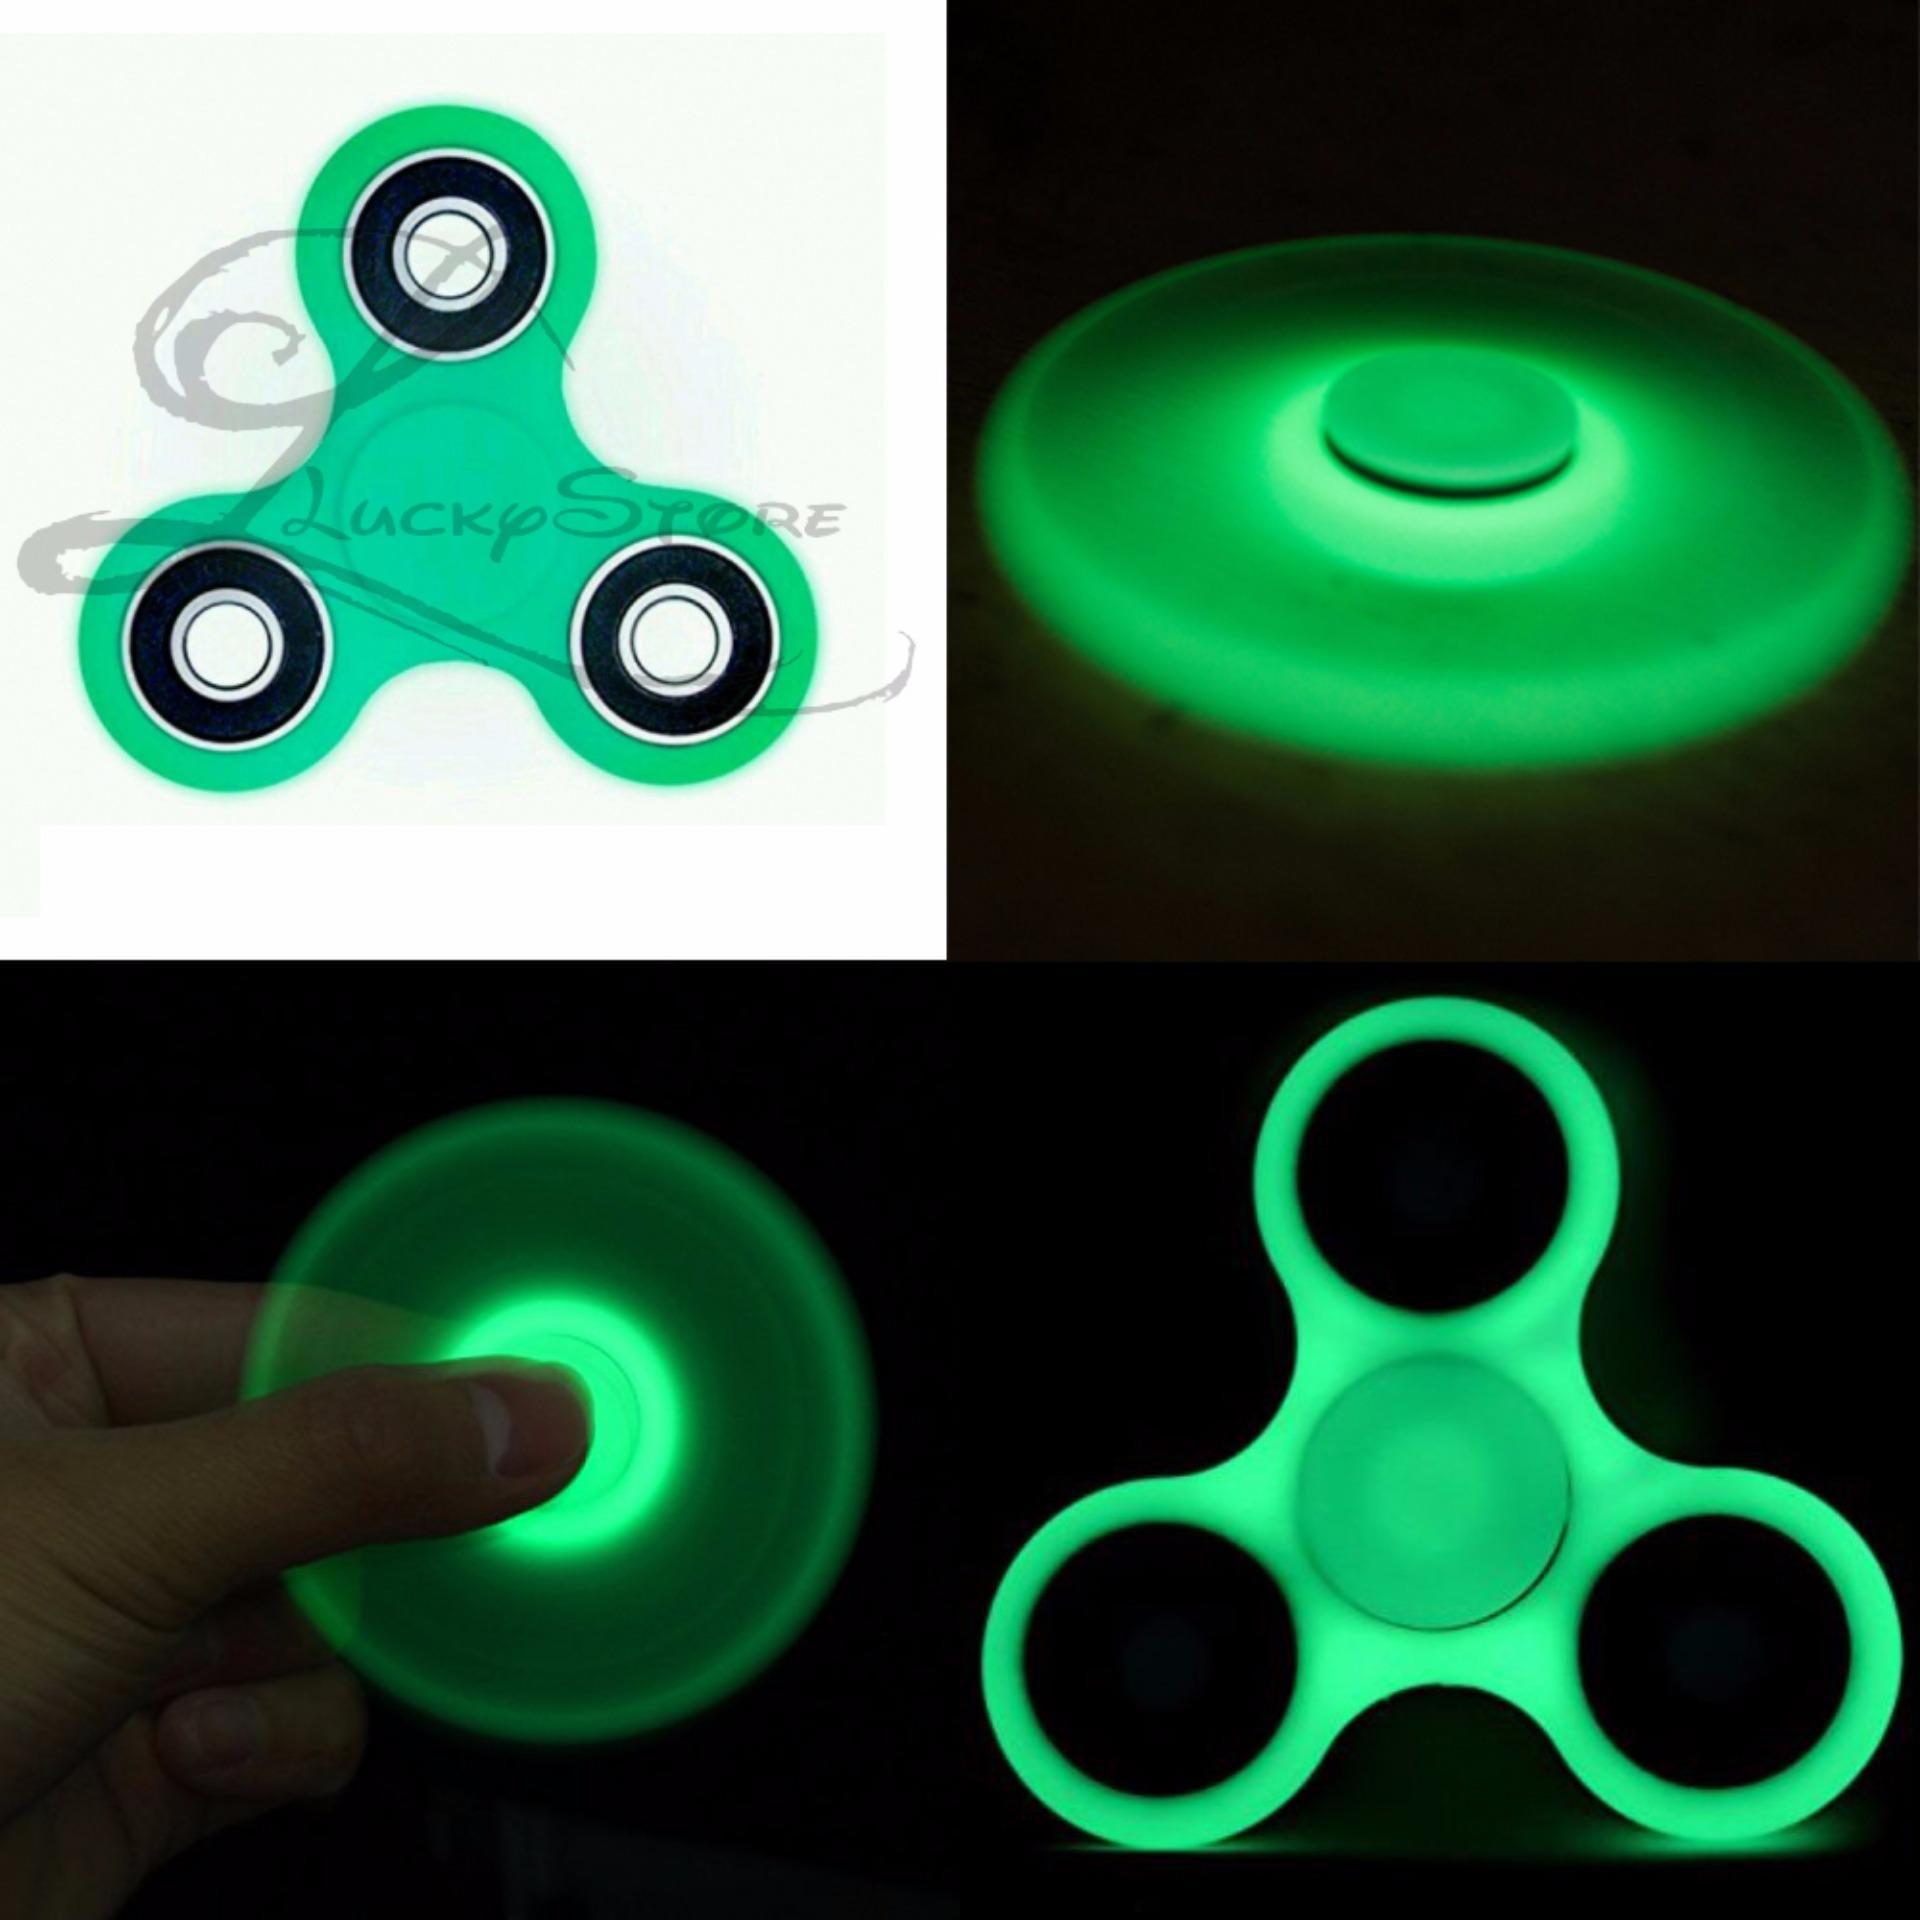 Lucky Glow In The Dark Fidget Spinner Hand Spinner Hand Toys Focus Games / Mainan Spiner